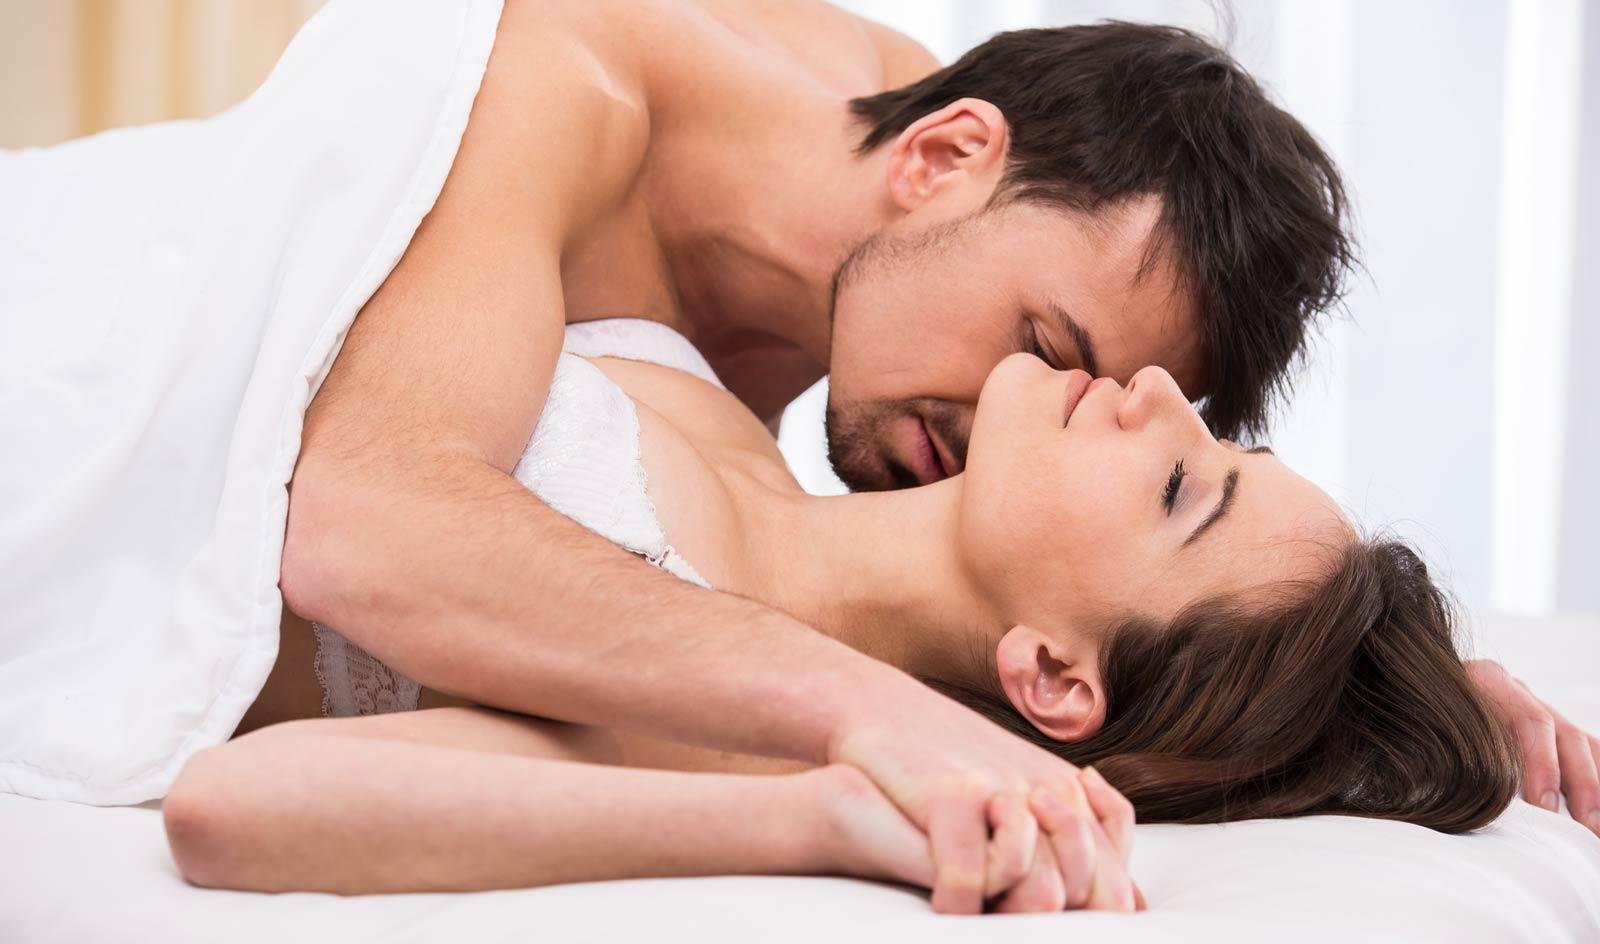 orgy-sluts-sexy-girls-man-naked